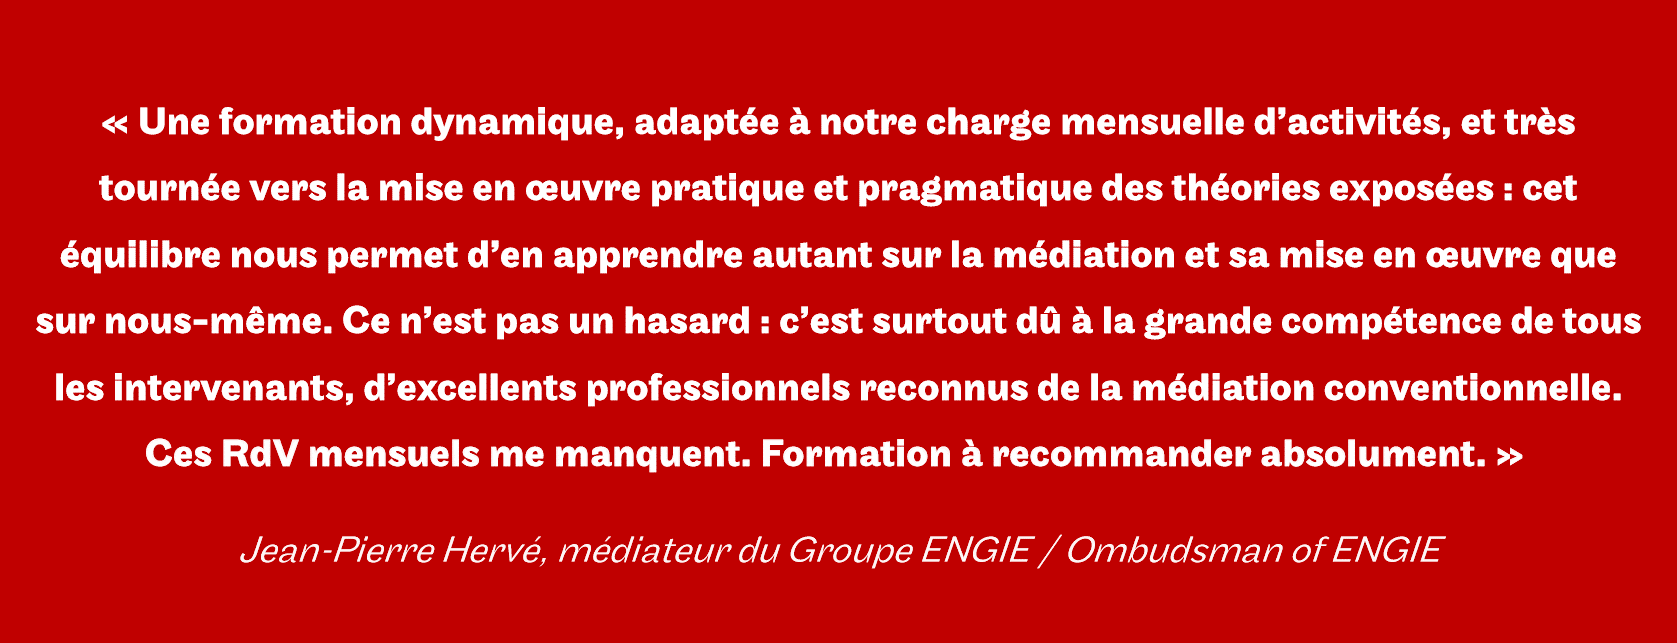 formation en médiation